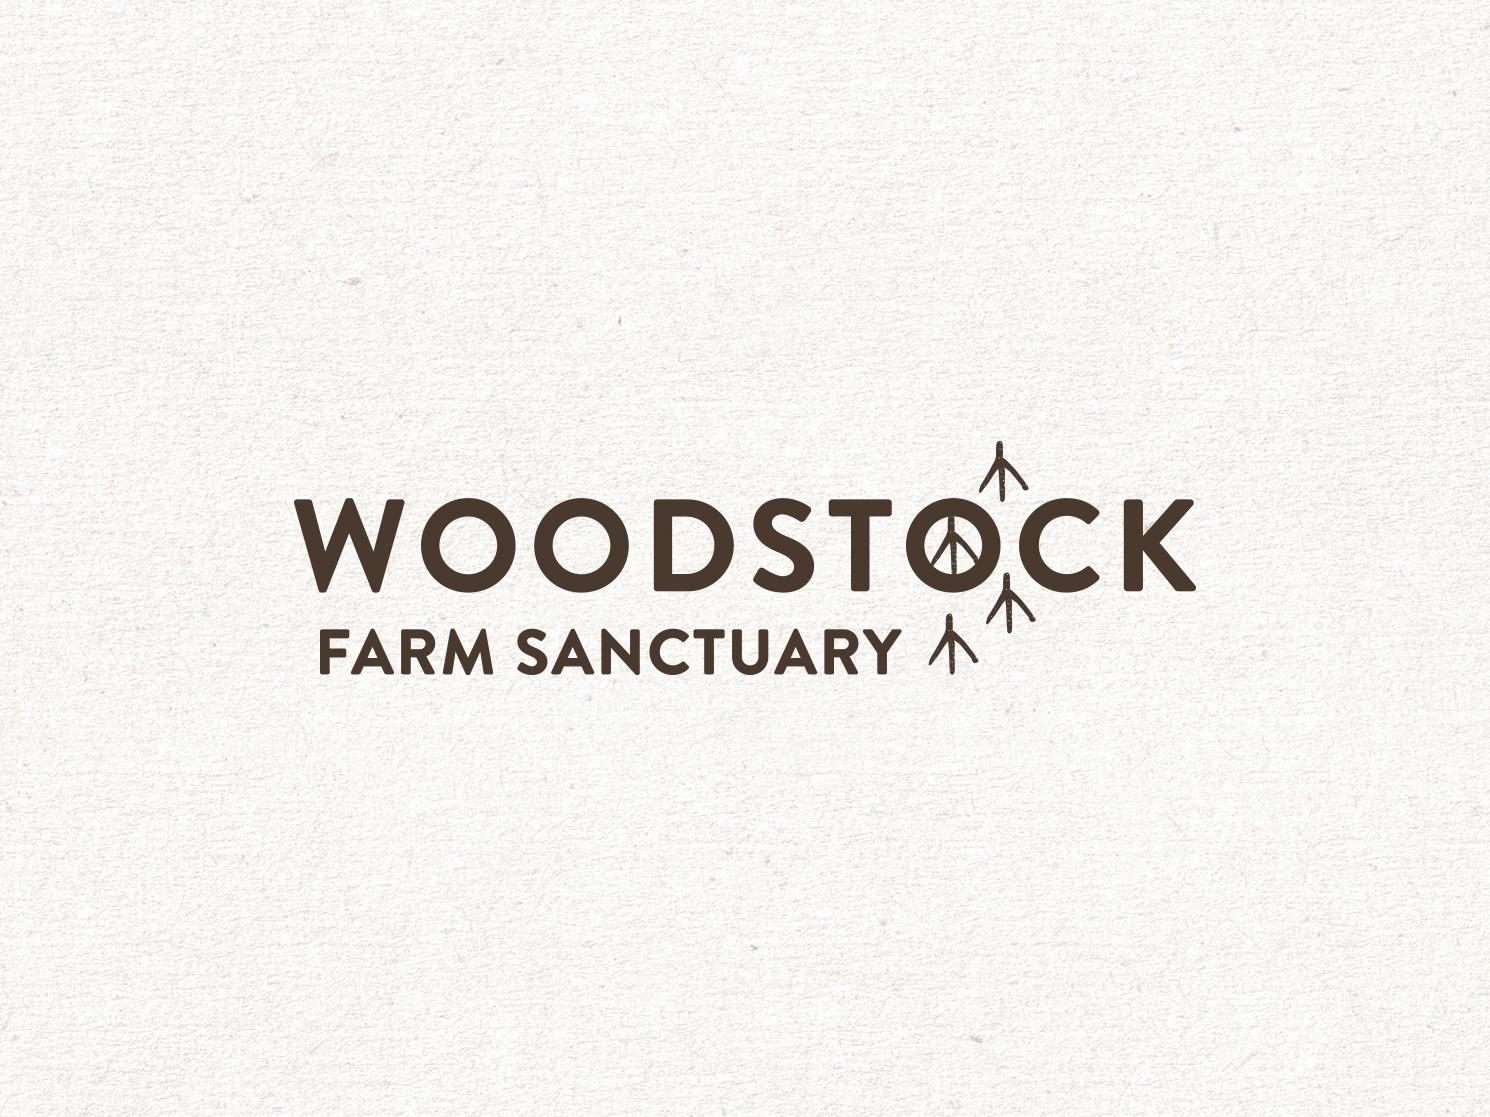 Woodstock Farm Sanctuary Logo earth tones logo farm logo peace sign sanctuary animal